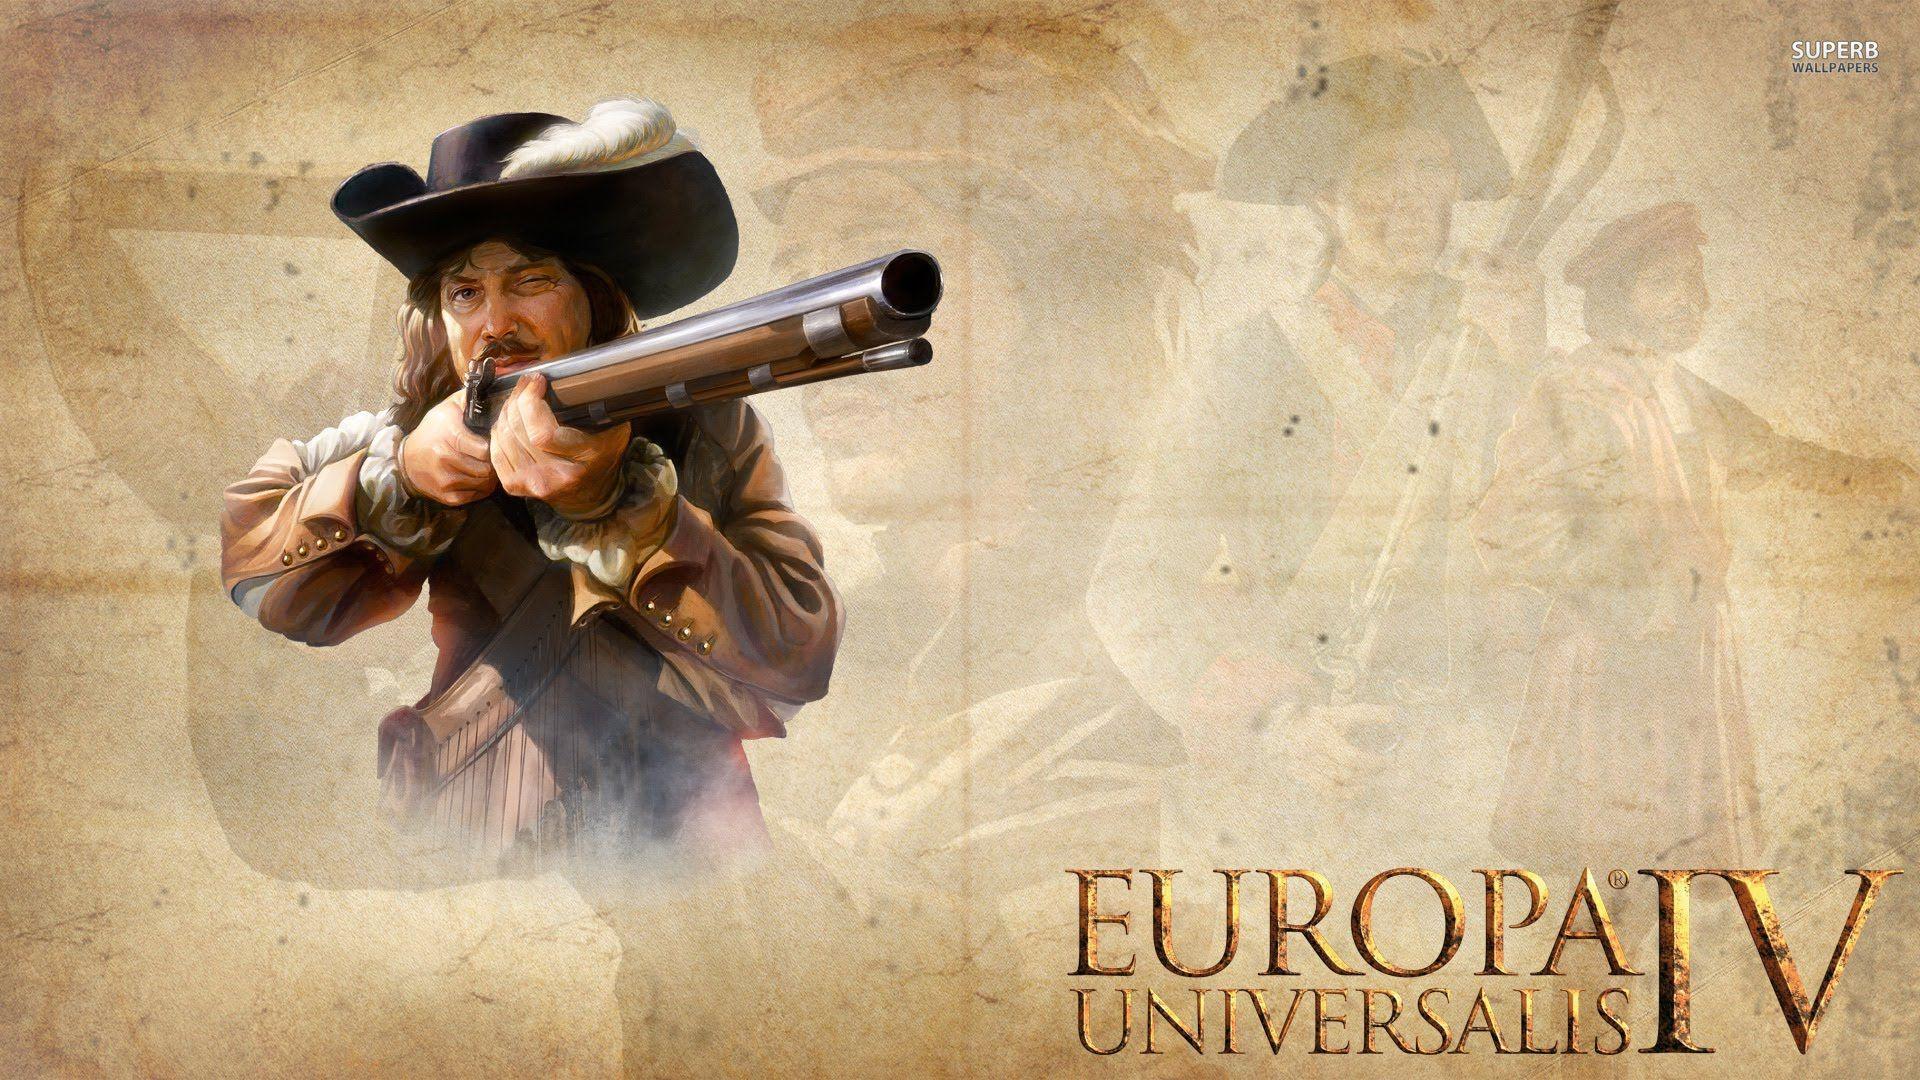 Europa Universalis 4 Gameplay 1080p Europa Universalis